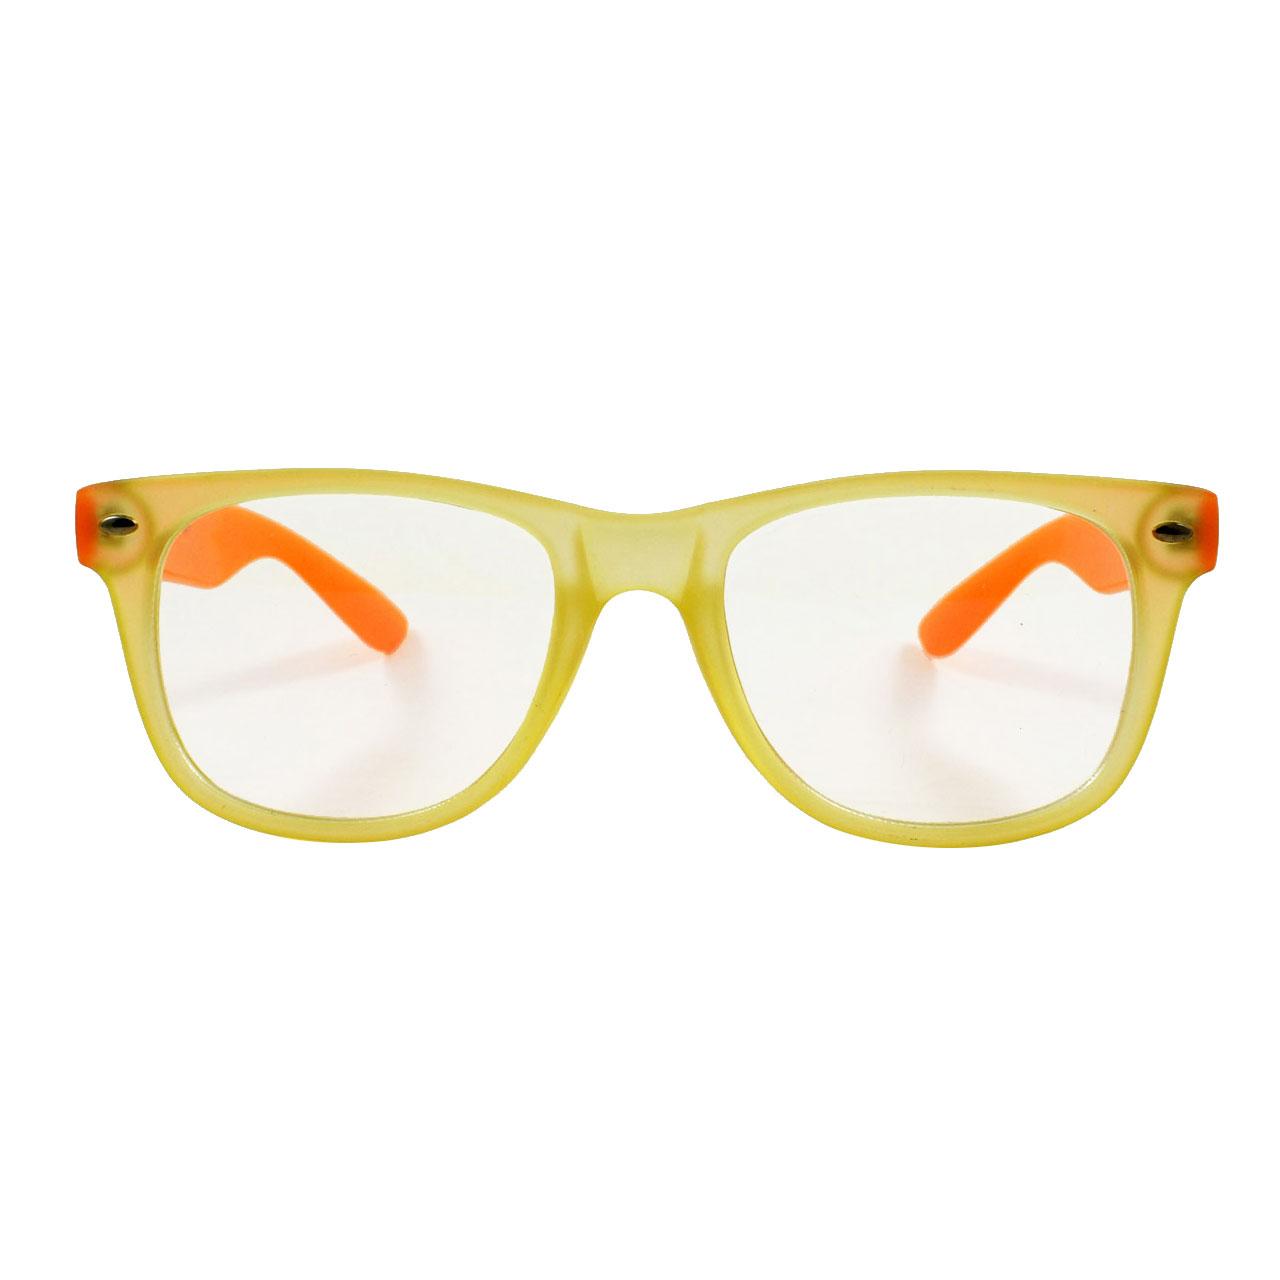 فریم عینک طبی مدل Mixed Colorful Wayfarer 9013